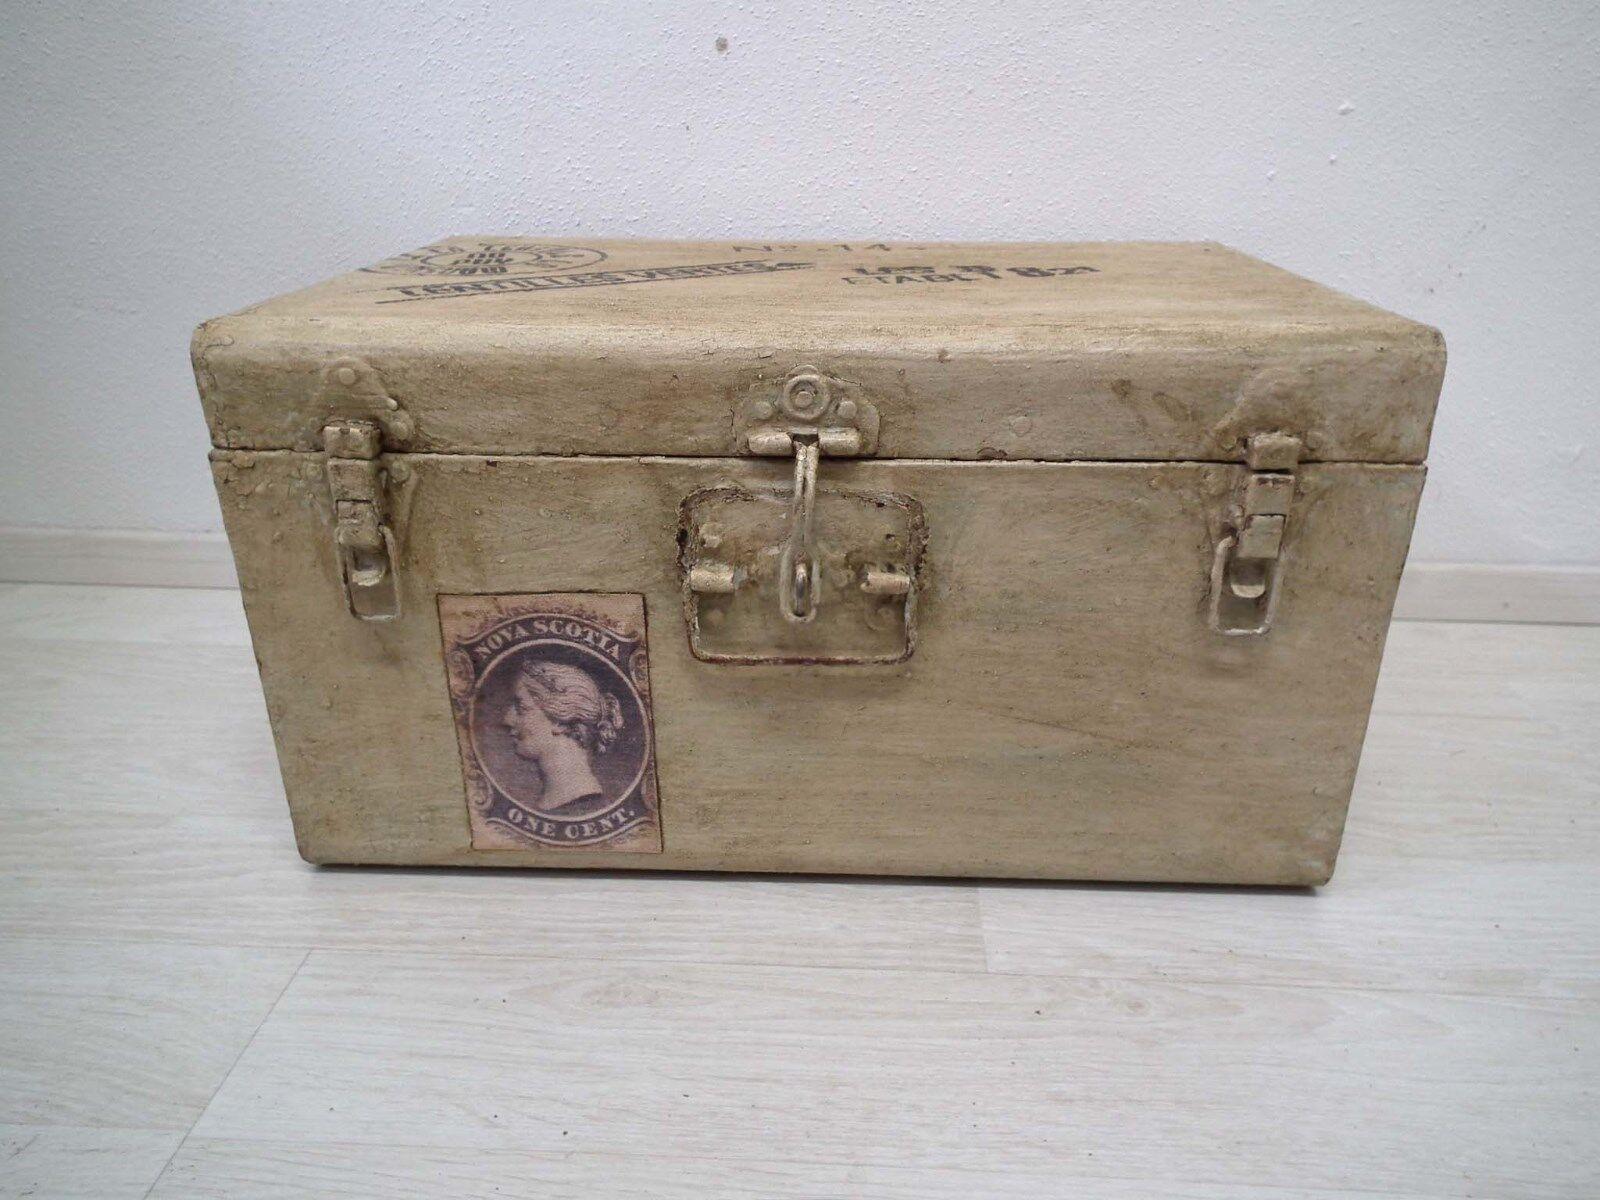 Truhe Box Kiste - Metall Eisen Blech - gelb auf alt gebraucht gemacht Shabby